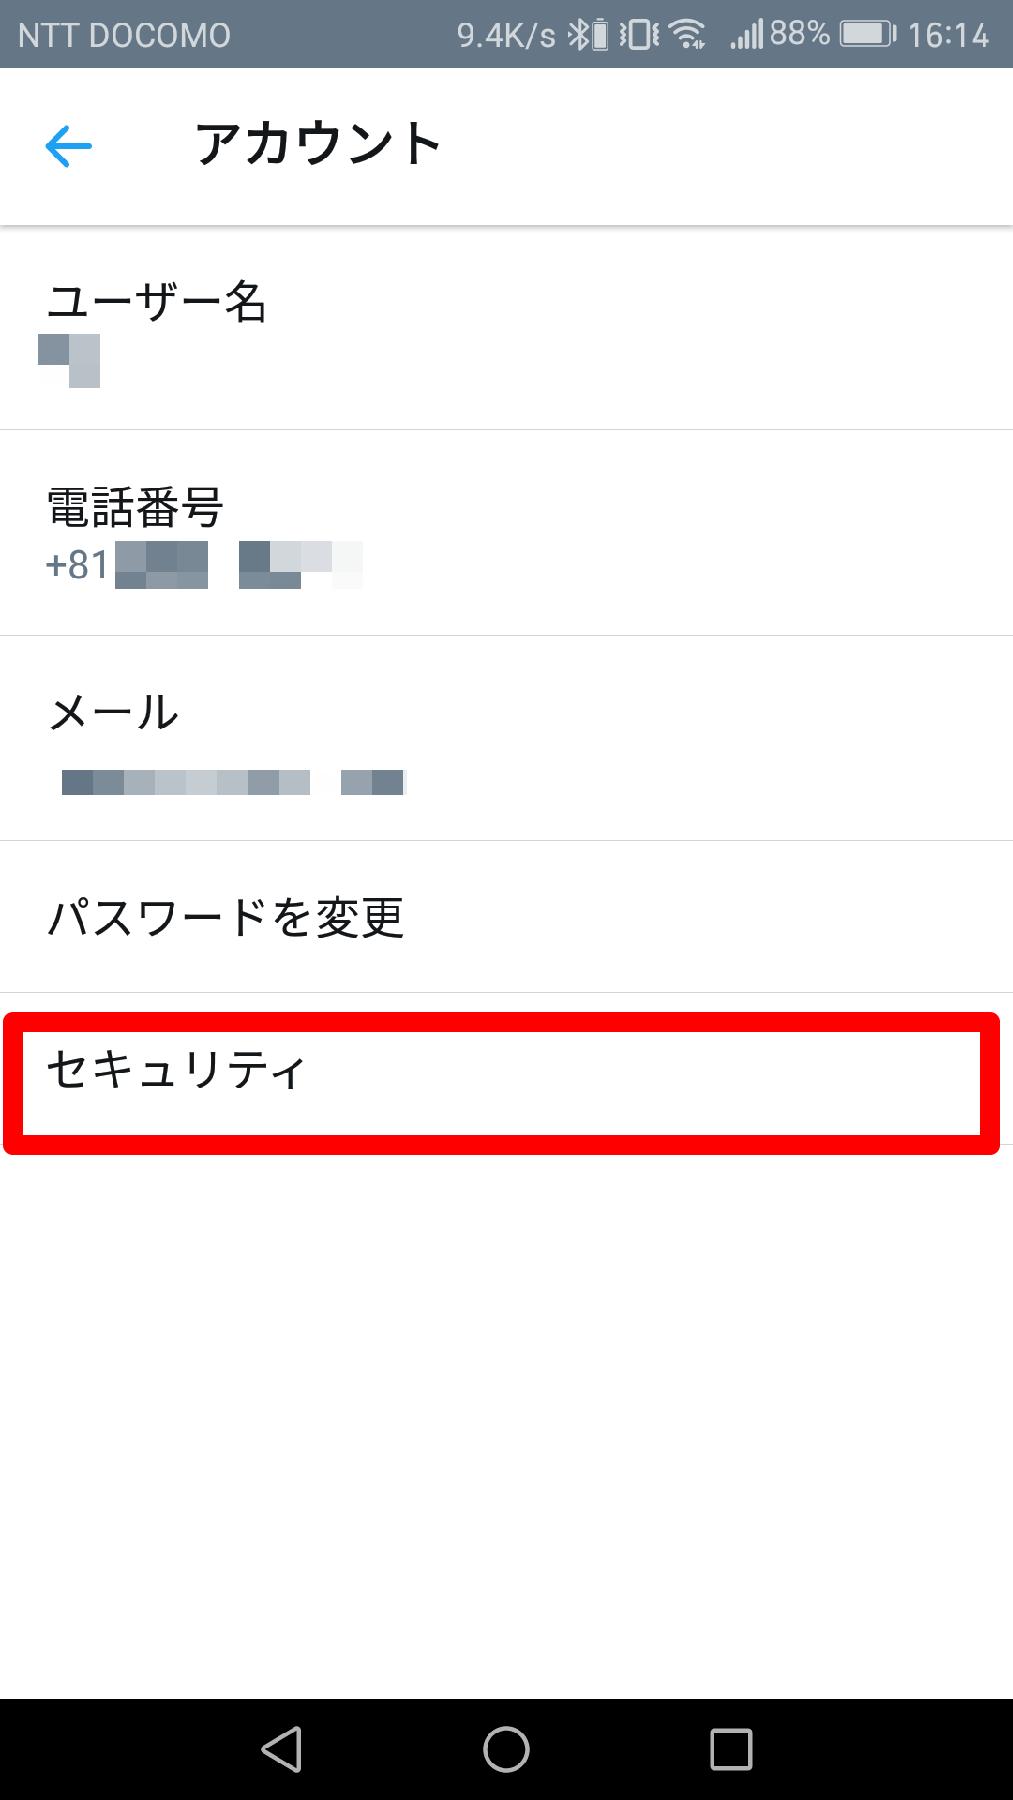 Twitter(ツイッター)の[アカウント]画面